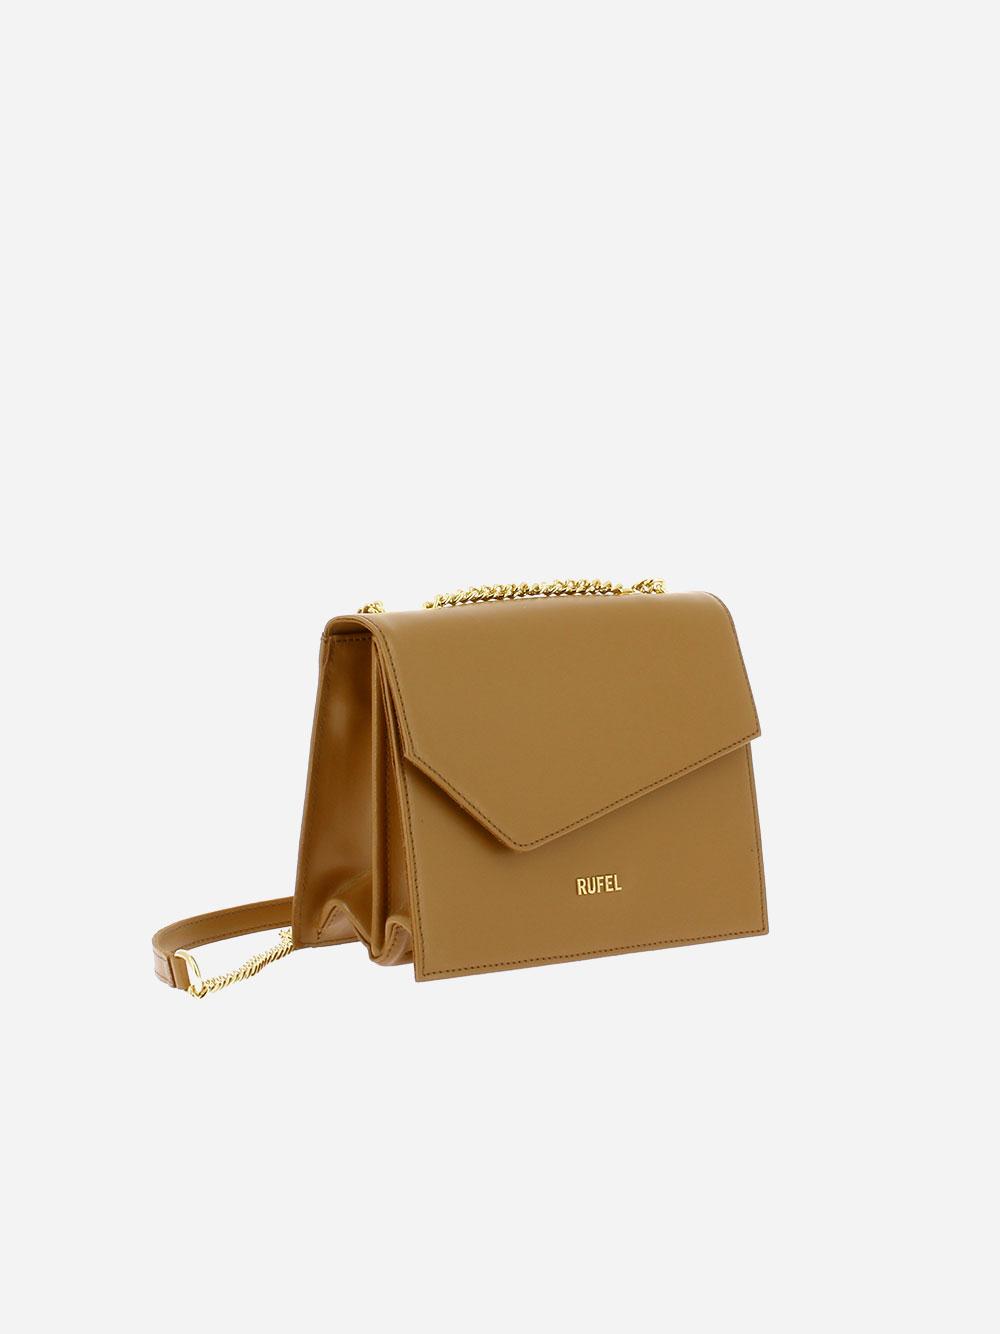 Soave Beige Crossbody Bag